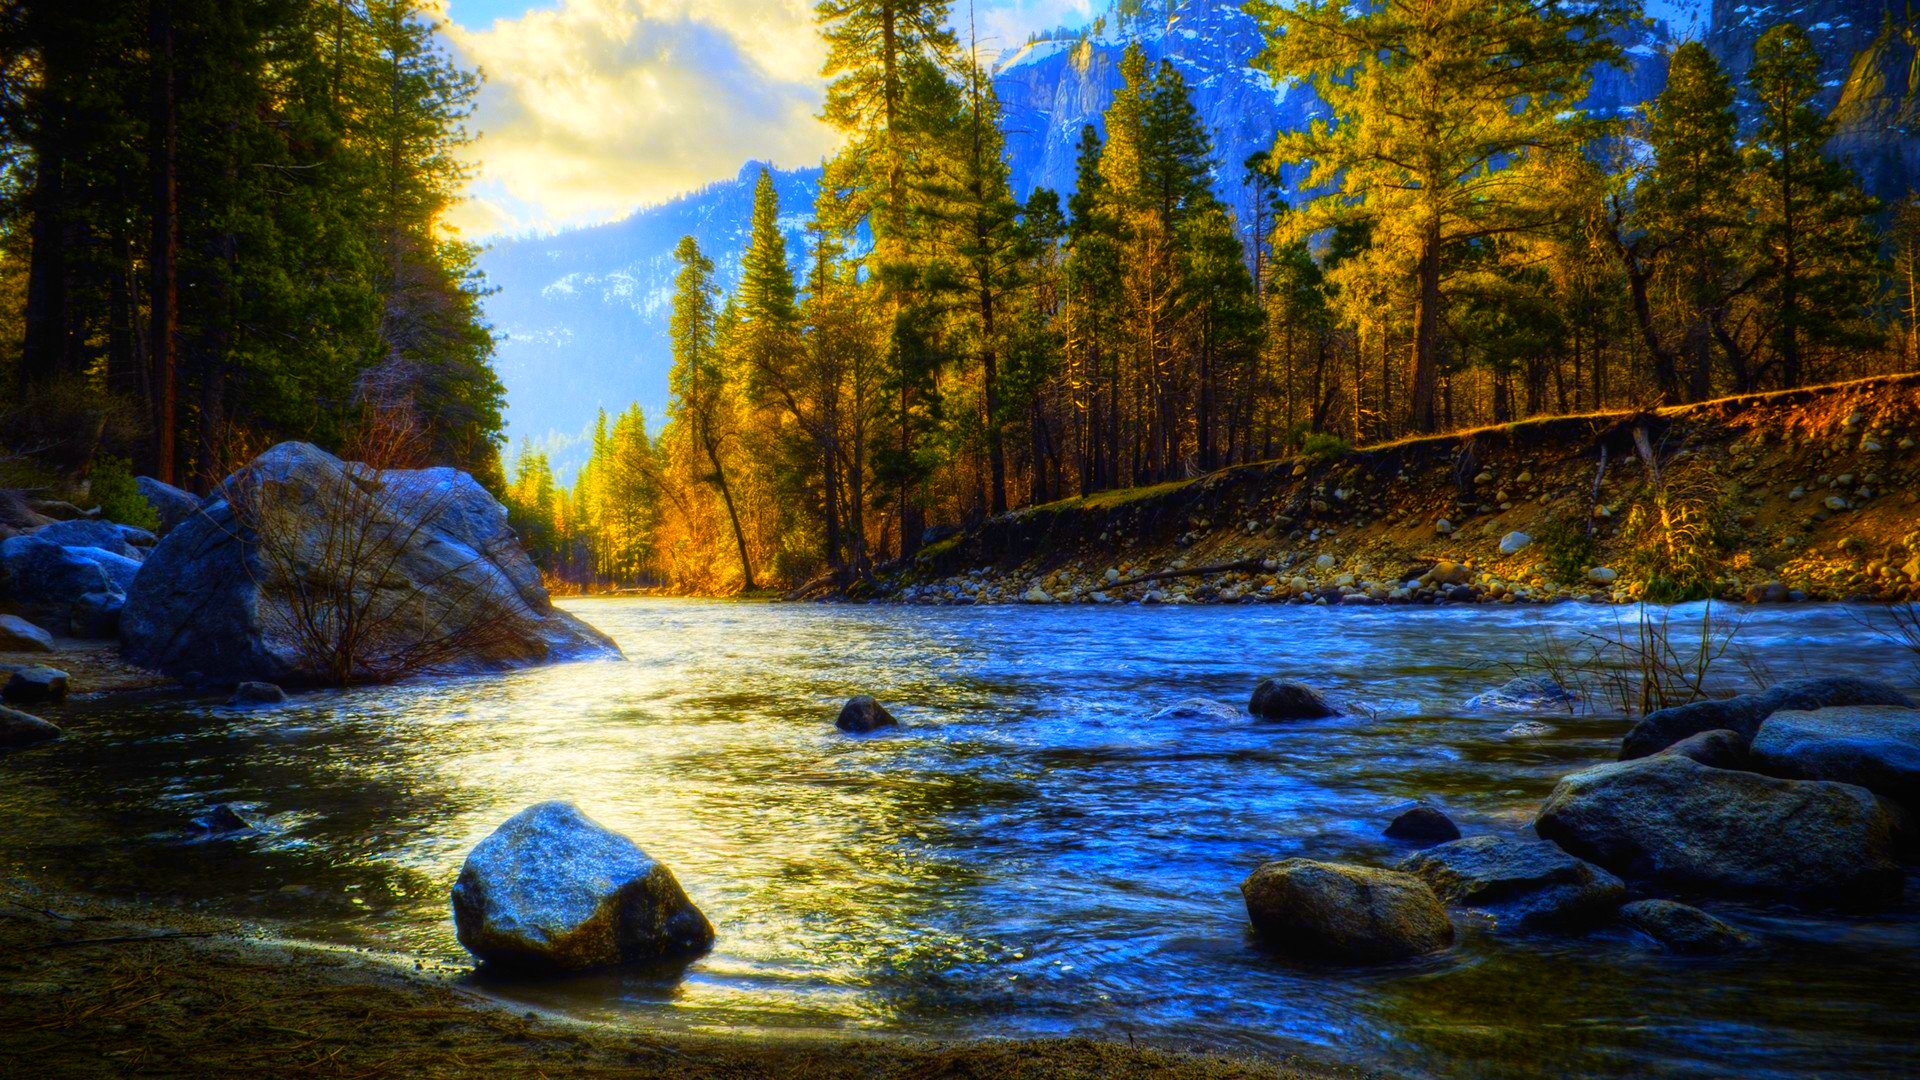 wallpaper nature river